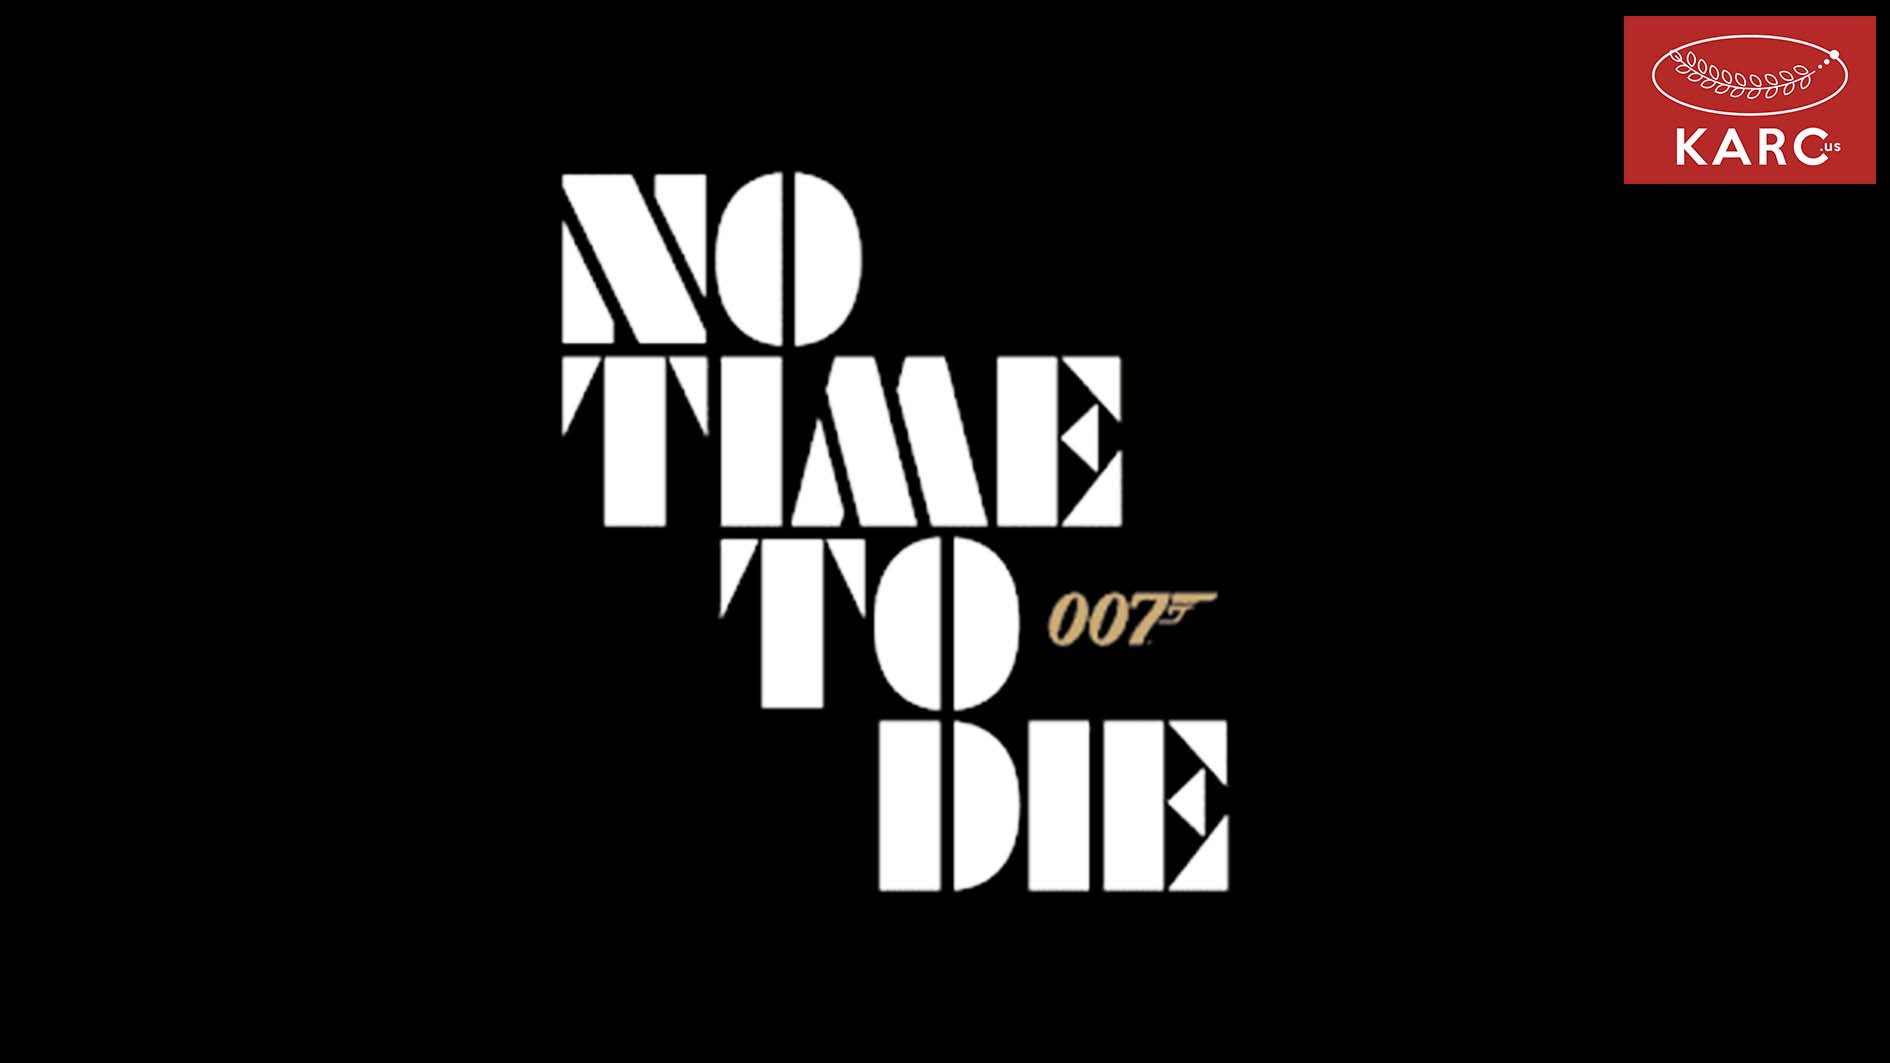 """No Time To Die"" เพลงประกอบสุดลึกล้ำของภาพยนตร์ James Bond ภาคใหม่ โดยนักร้องสาวเสียงดี Billie Eilish - Karc.us"